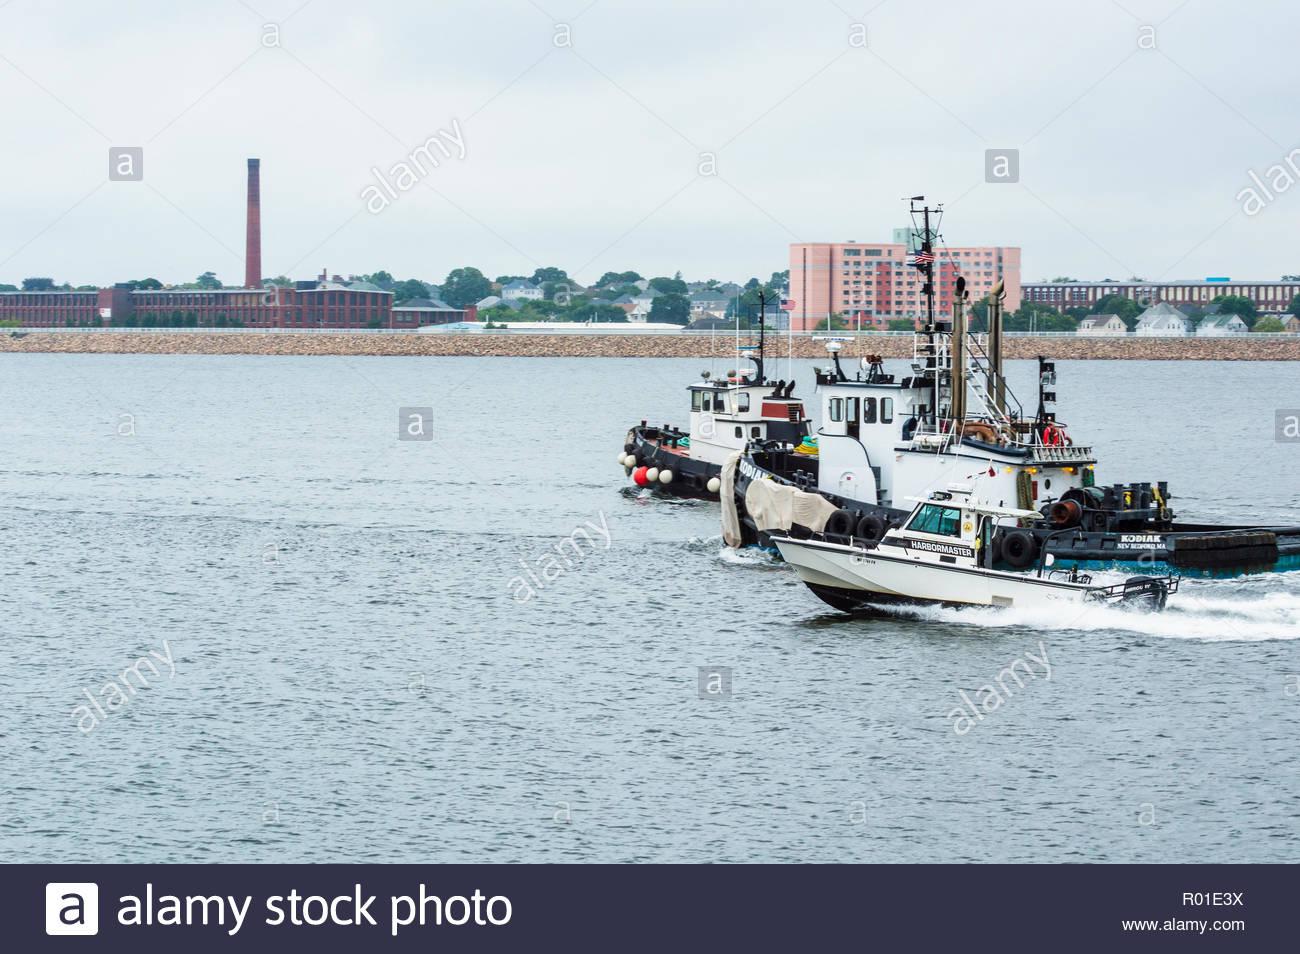 New Bedford, Massachusetts, STATI UNITI D'AMERICA - Agosto 15, 2018: Fairhaven harbourmaster la motovedetta accelerando il passato rimorchiatori Jaguar e Kodiak Immagini Stock